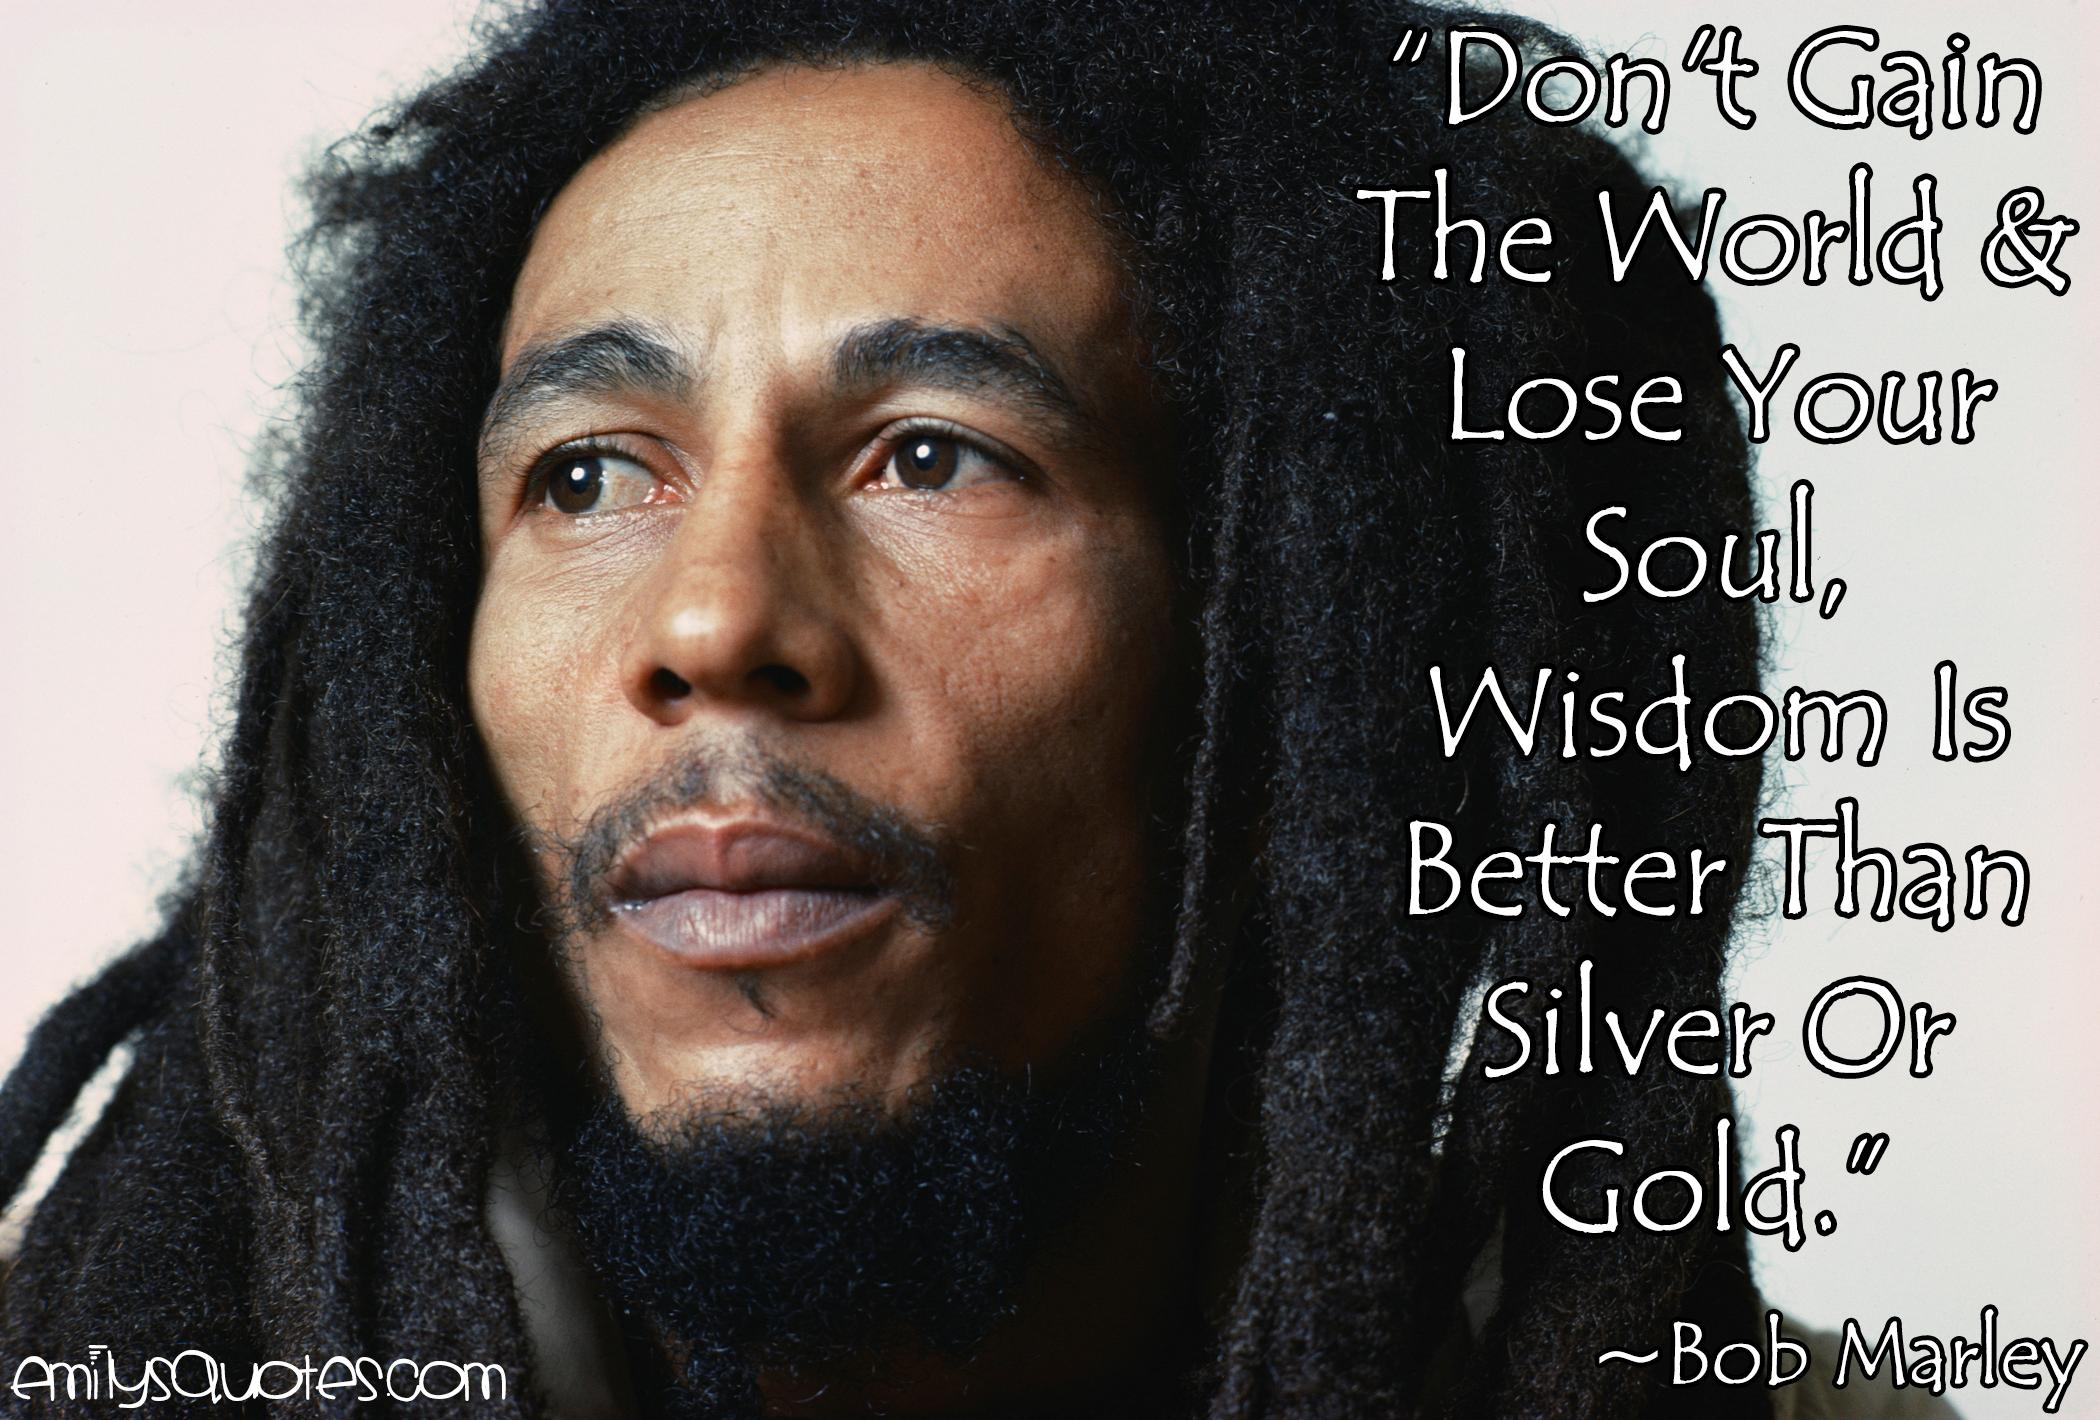 EmilysQuotes.Com - wisdom, peace, Bob Marley, amazing, great